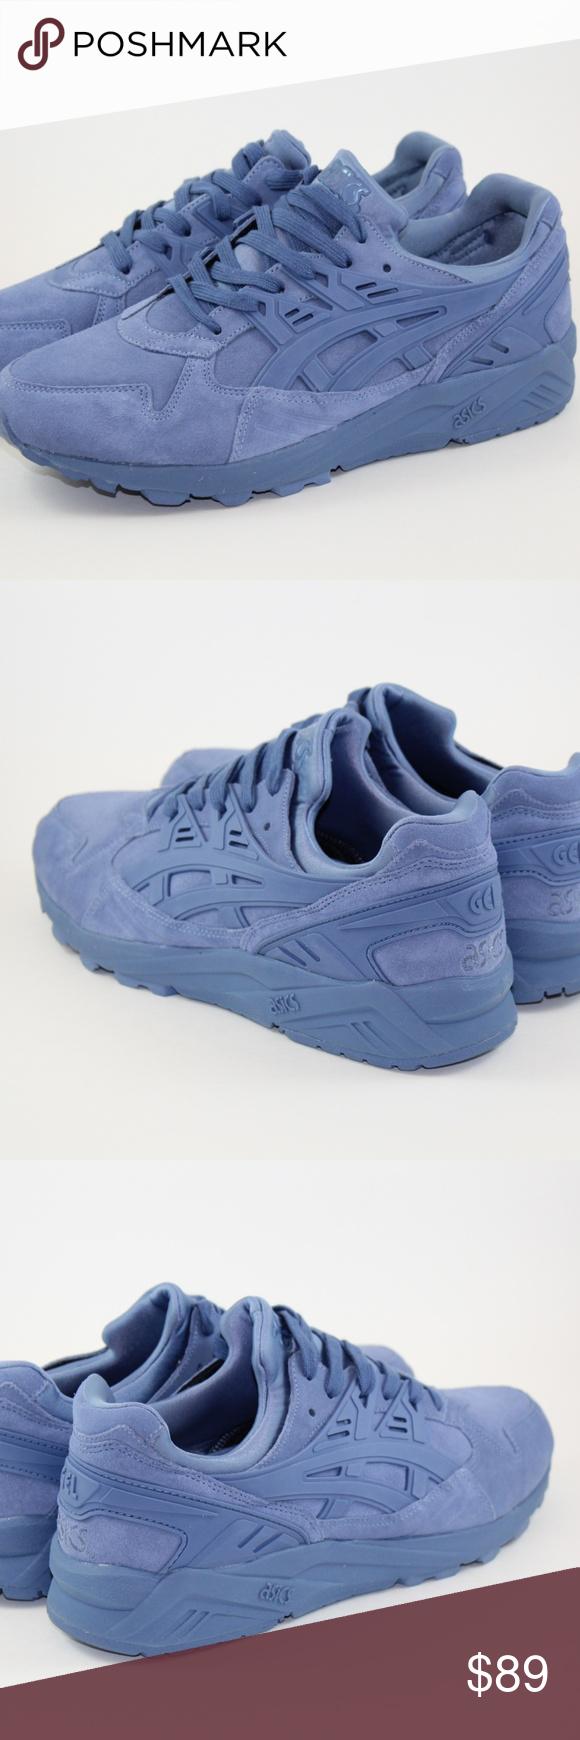 online store 92a7b e40f6 ASICS Gel Kayano Trainer Running Shoe Size 10 ASICS Gel ...